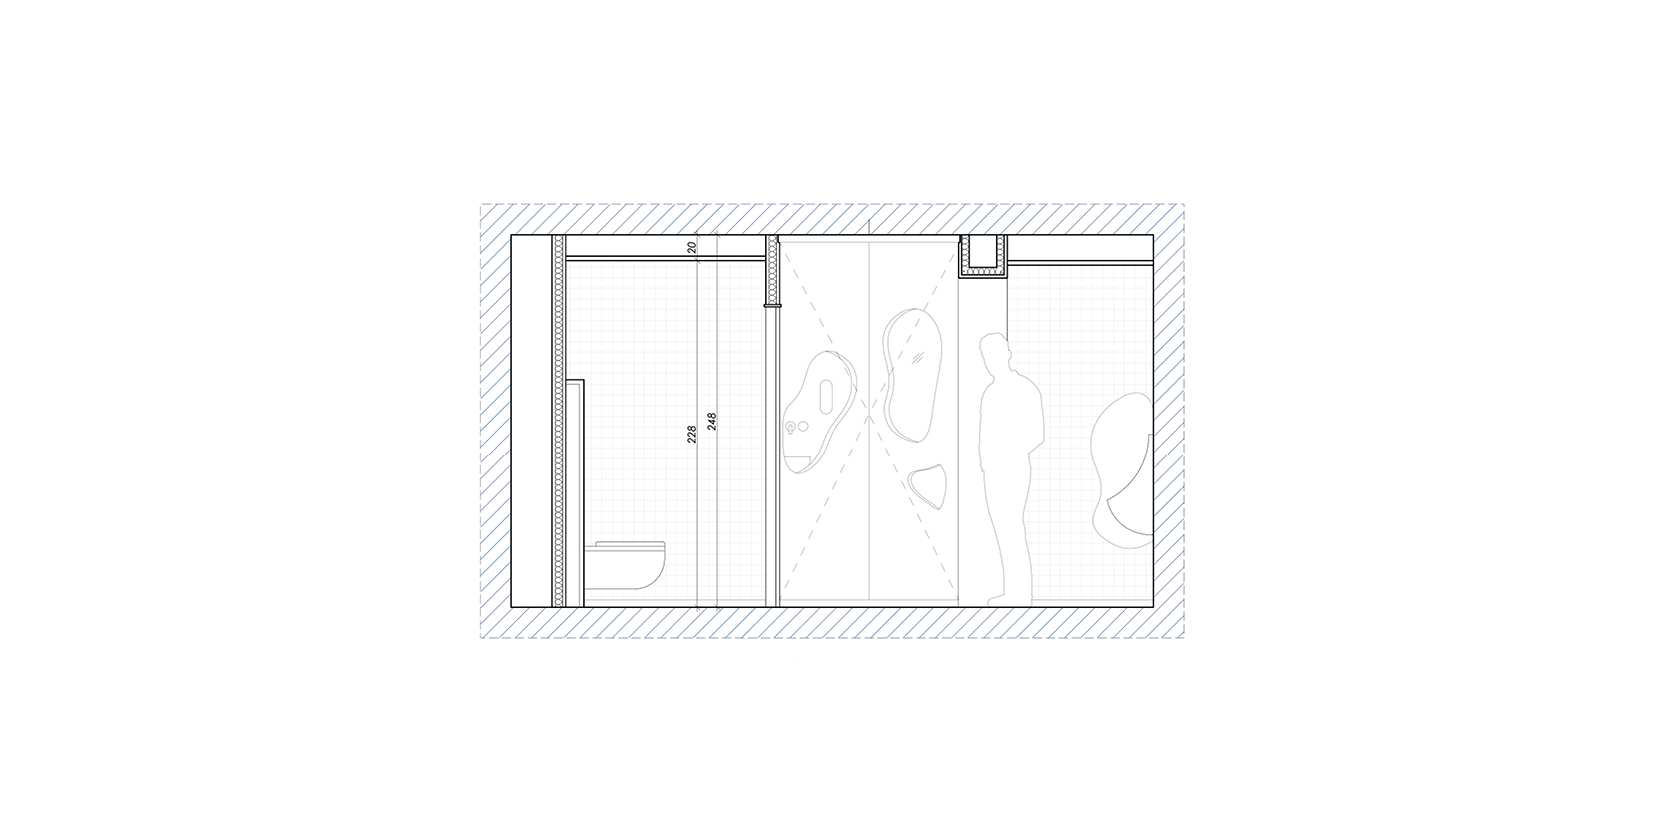 Reforma lavabos estadistica IDESCAT OCA Architects Arquitectura architecture interior design disseny interior Hernan Lleida Bernardo Garcia7